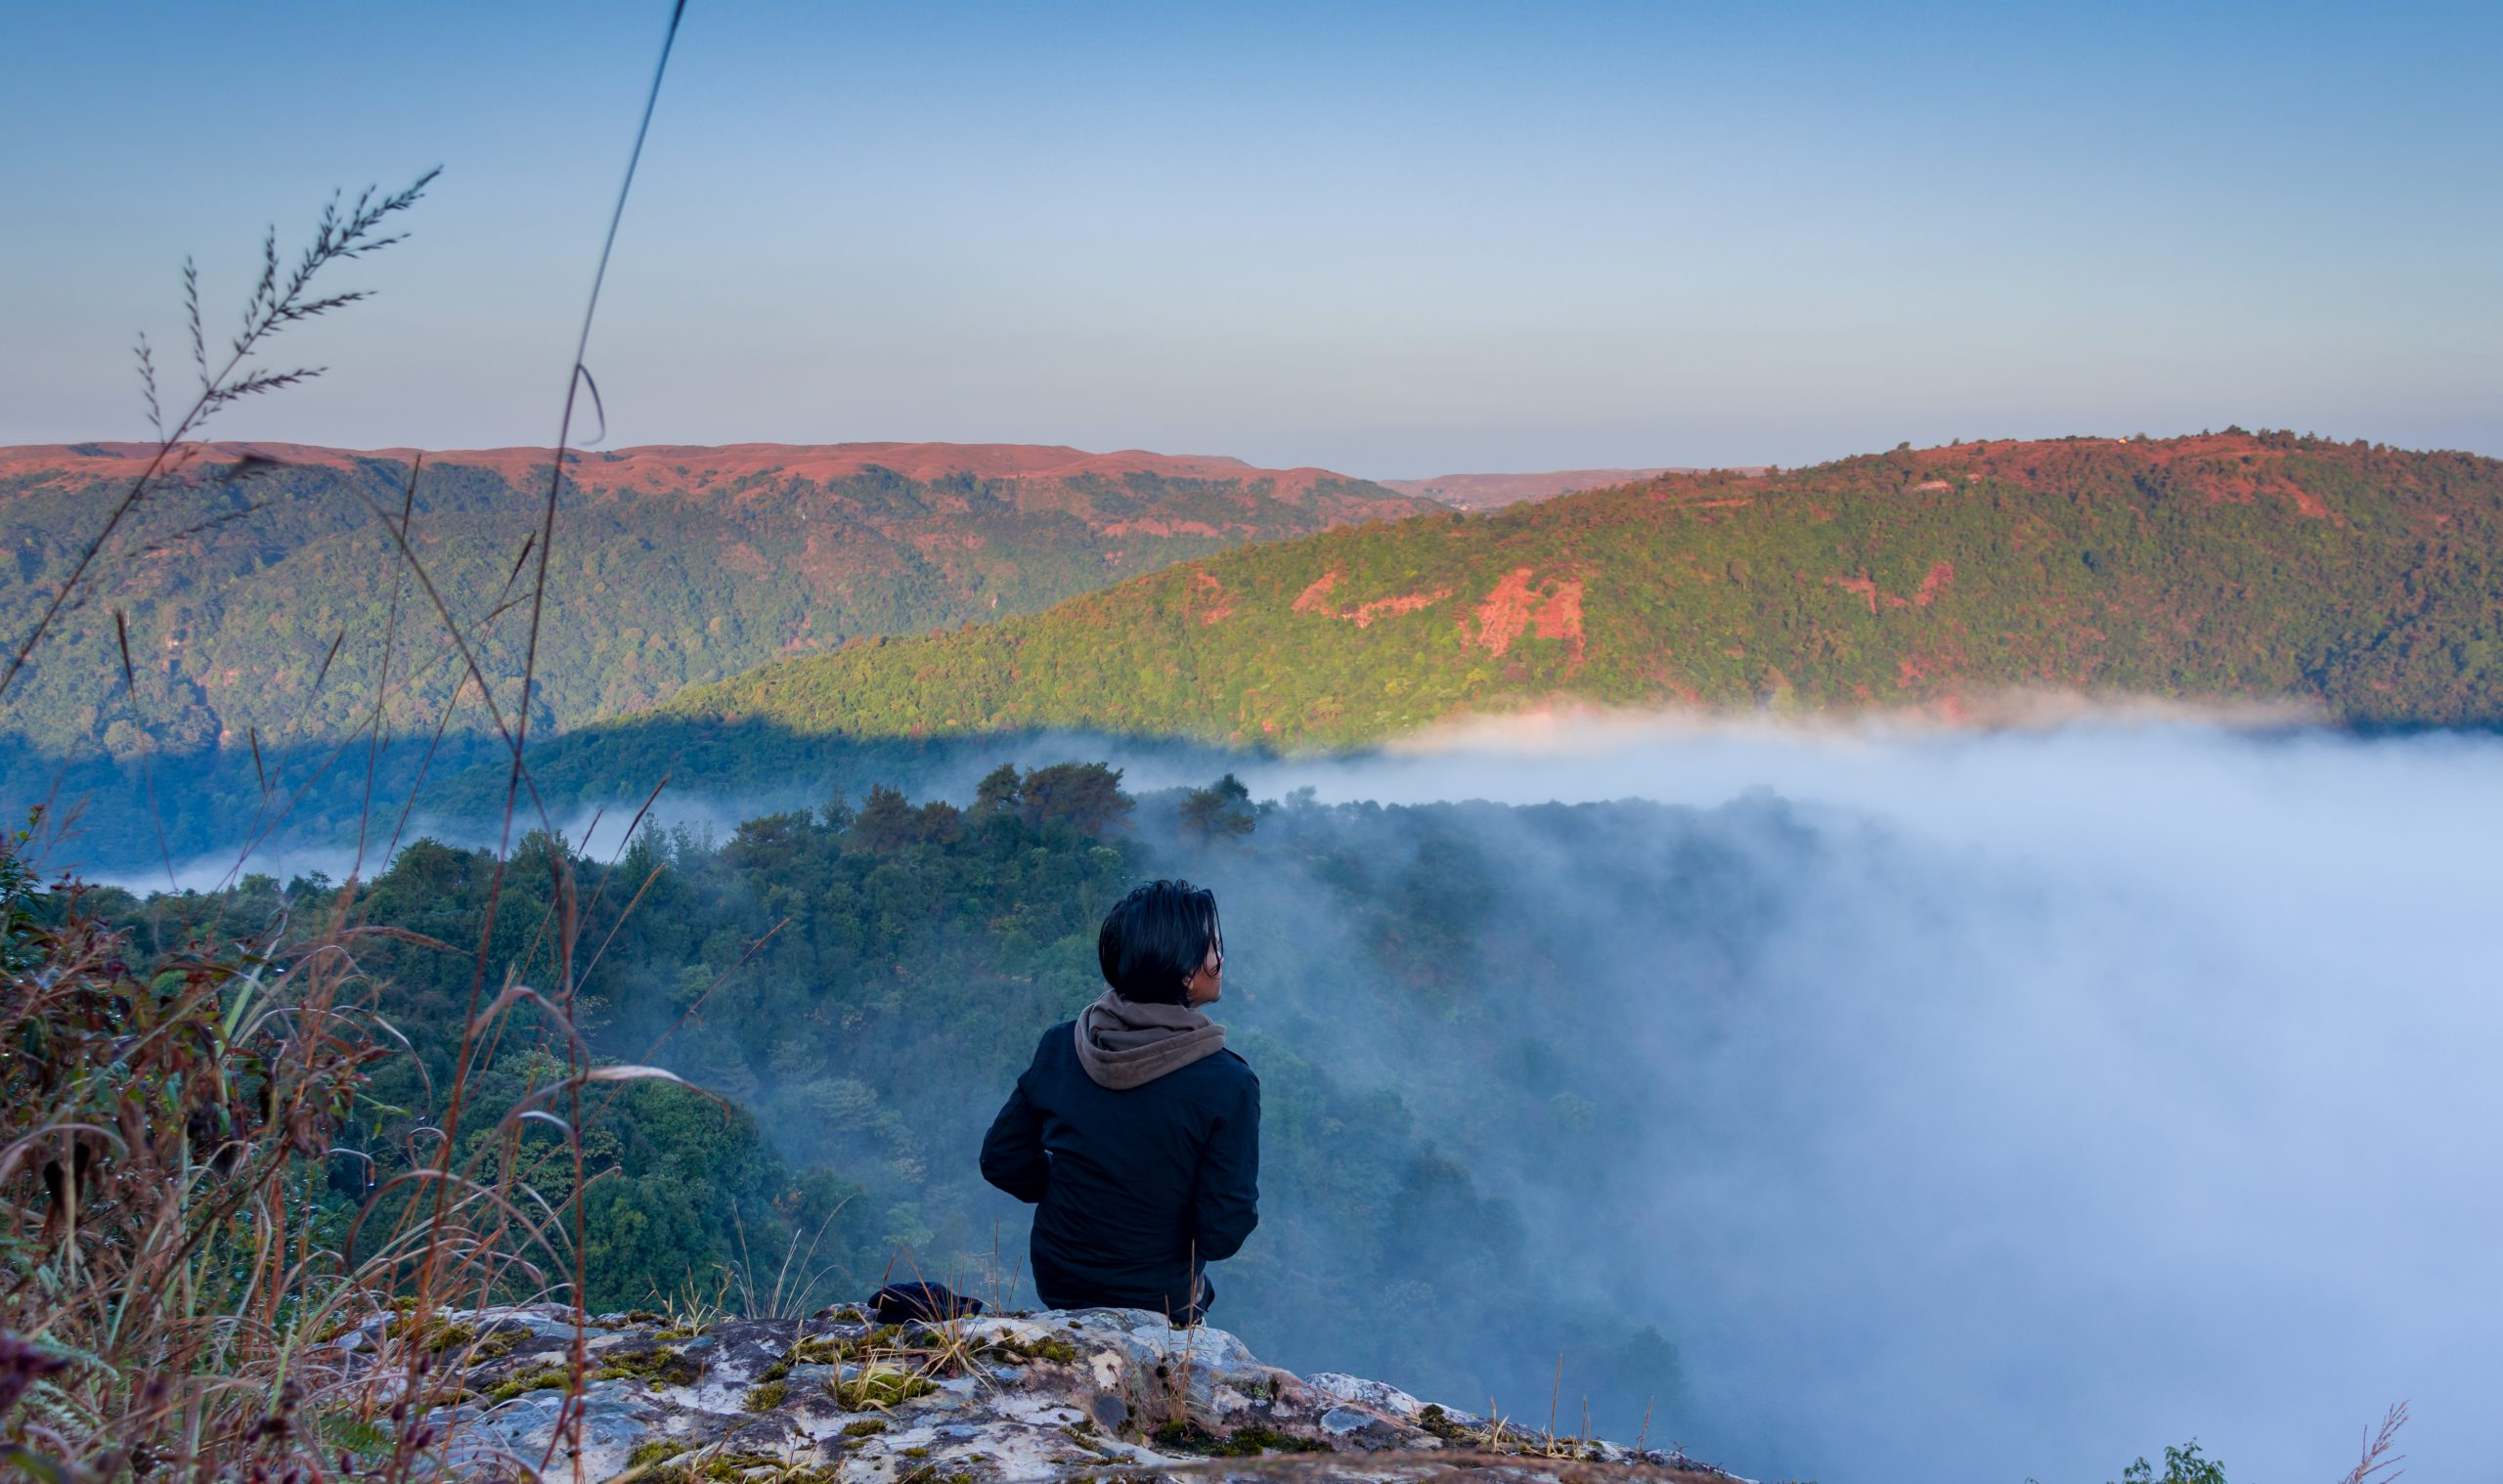 A boy enjoying the nature